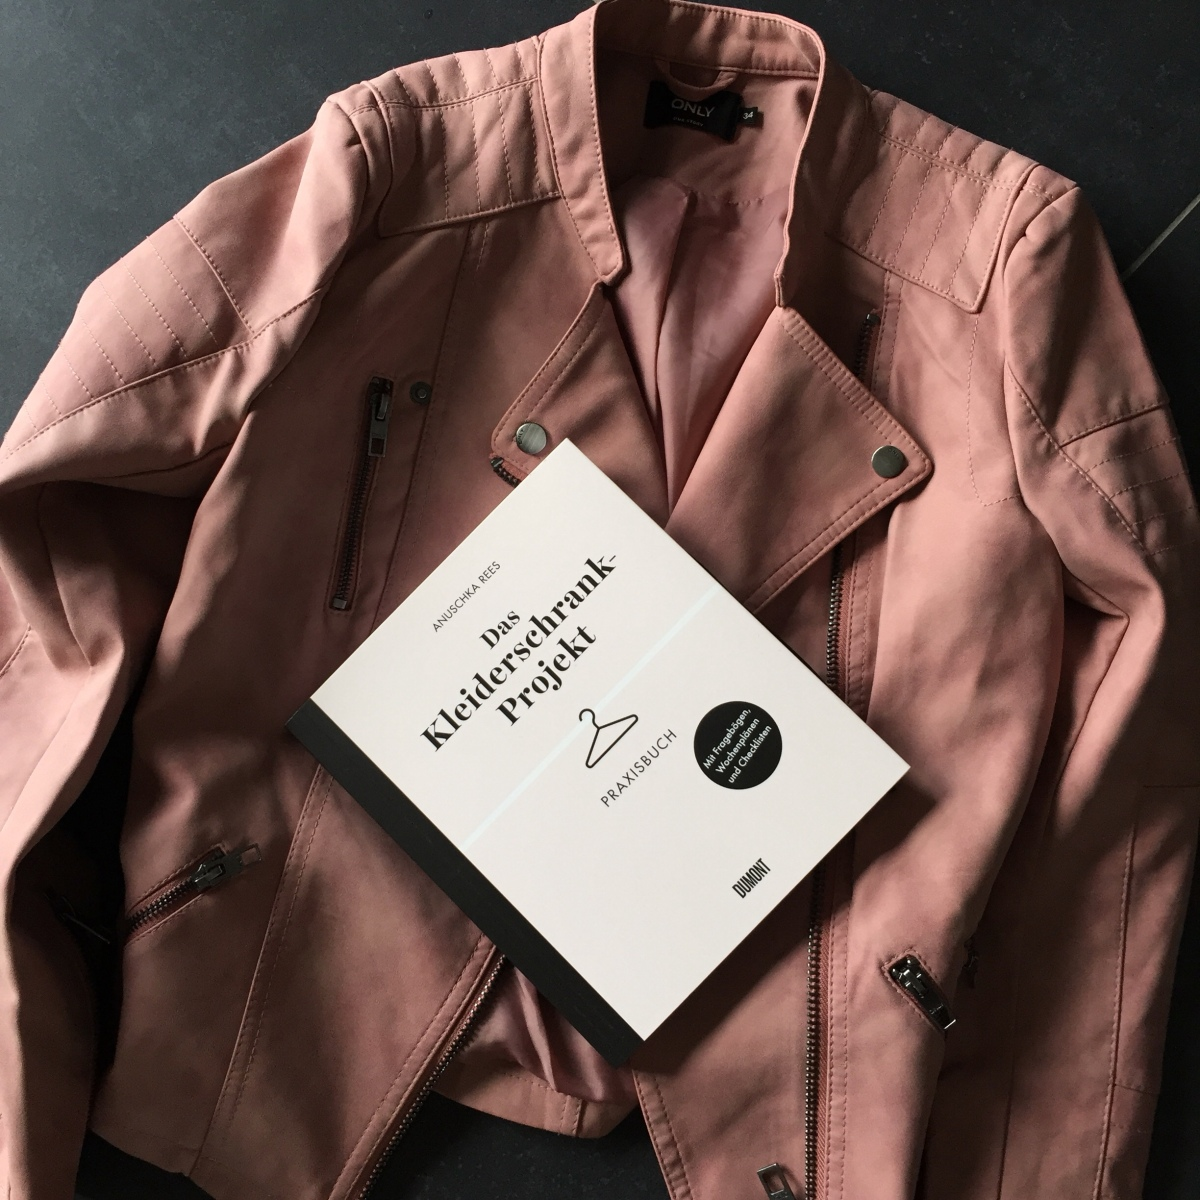 Das Kleiderschrank-Projekt Praxisbuch